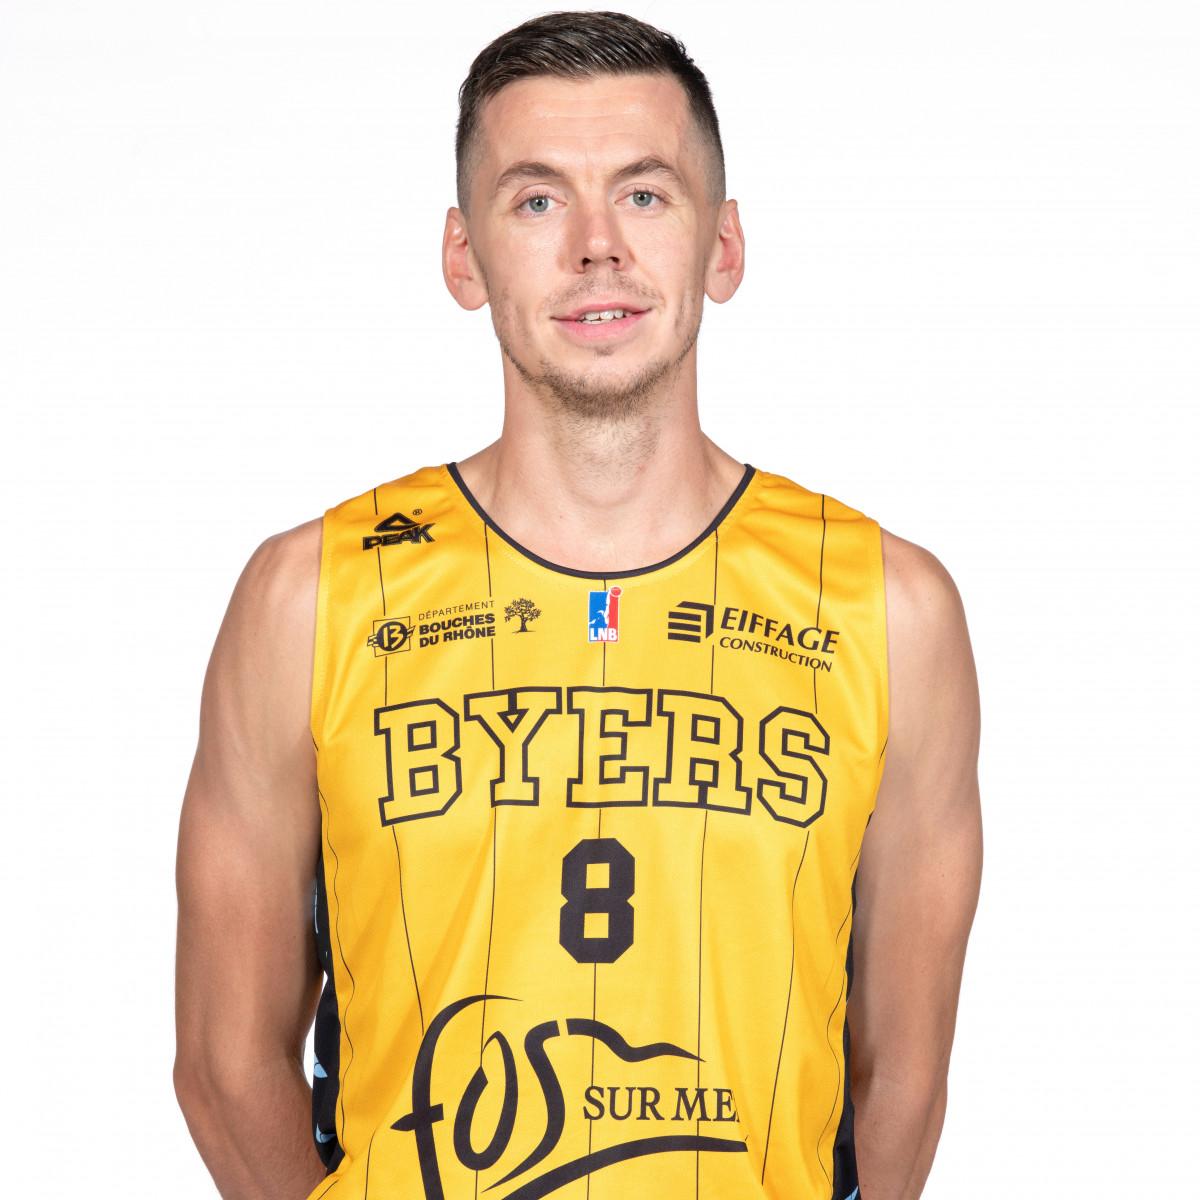 Photo of Edouard Choquet, 2019-2020 season